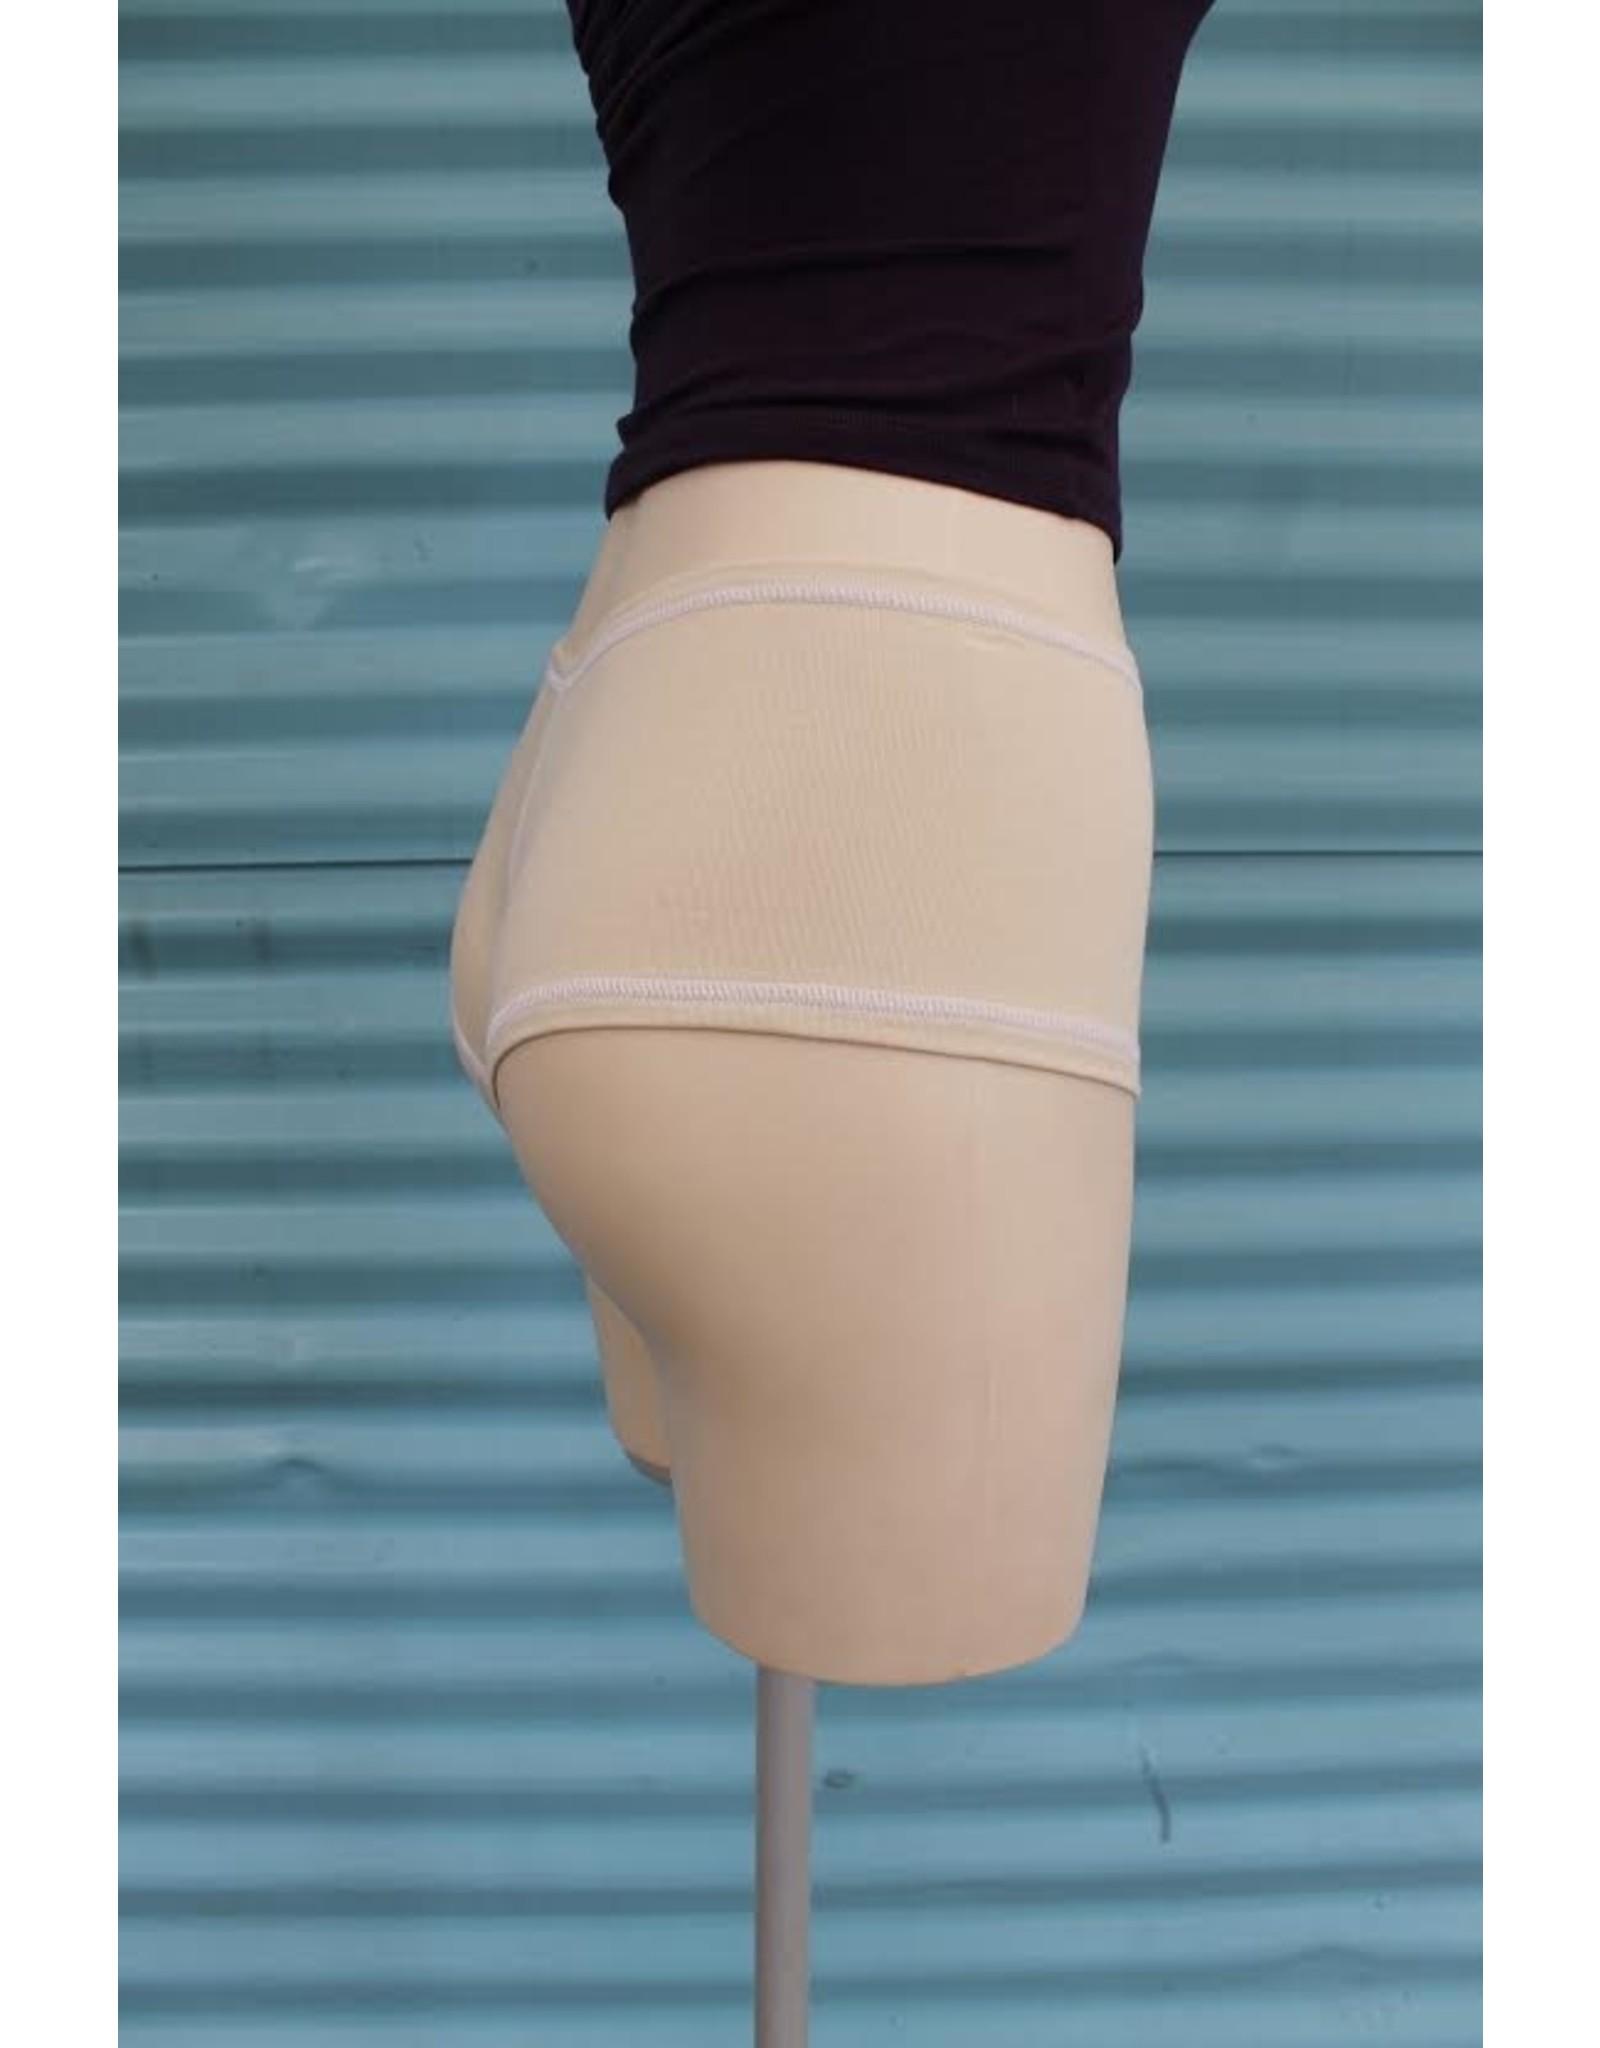 Devil May Wear Hot Shorts Bamboo Blend Underwear. Cream